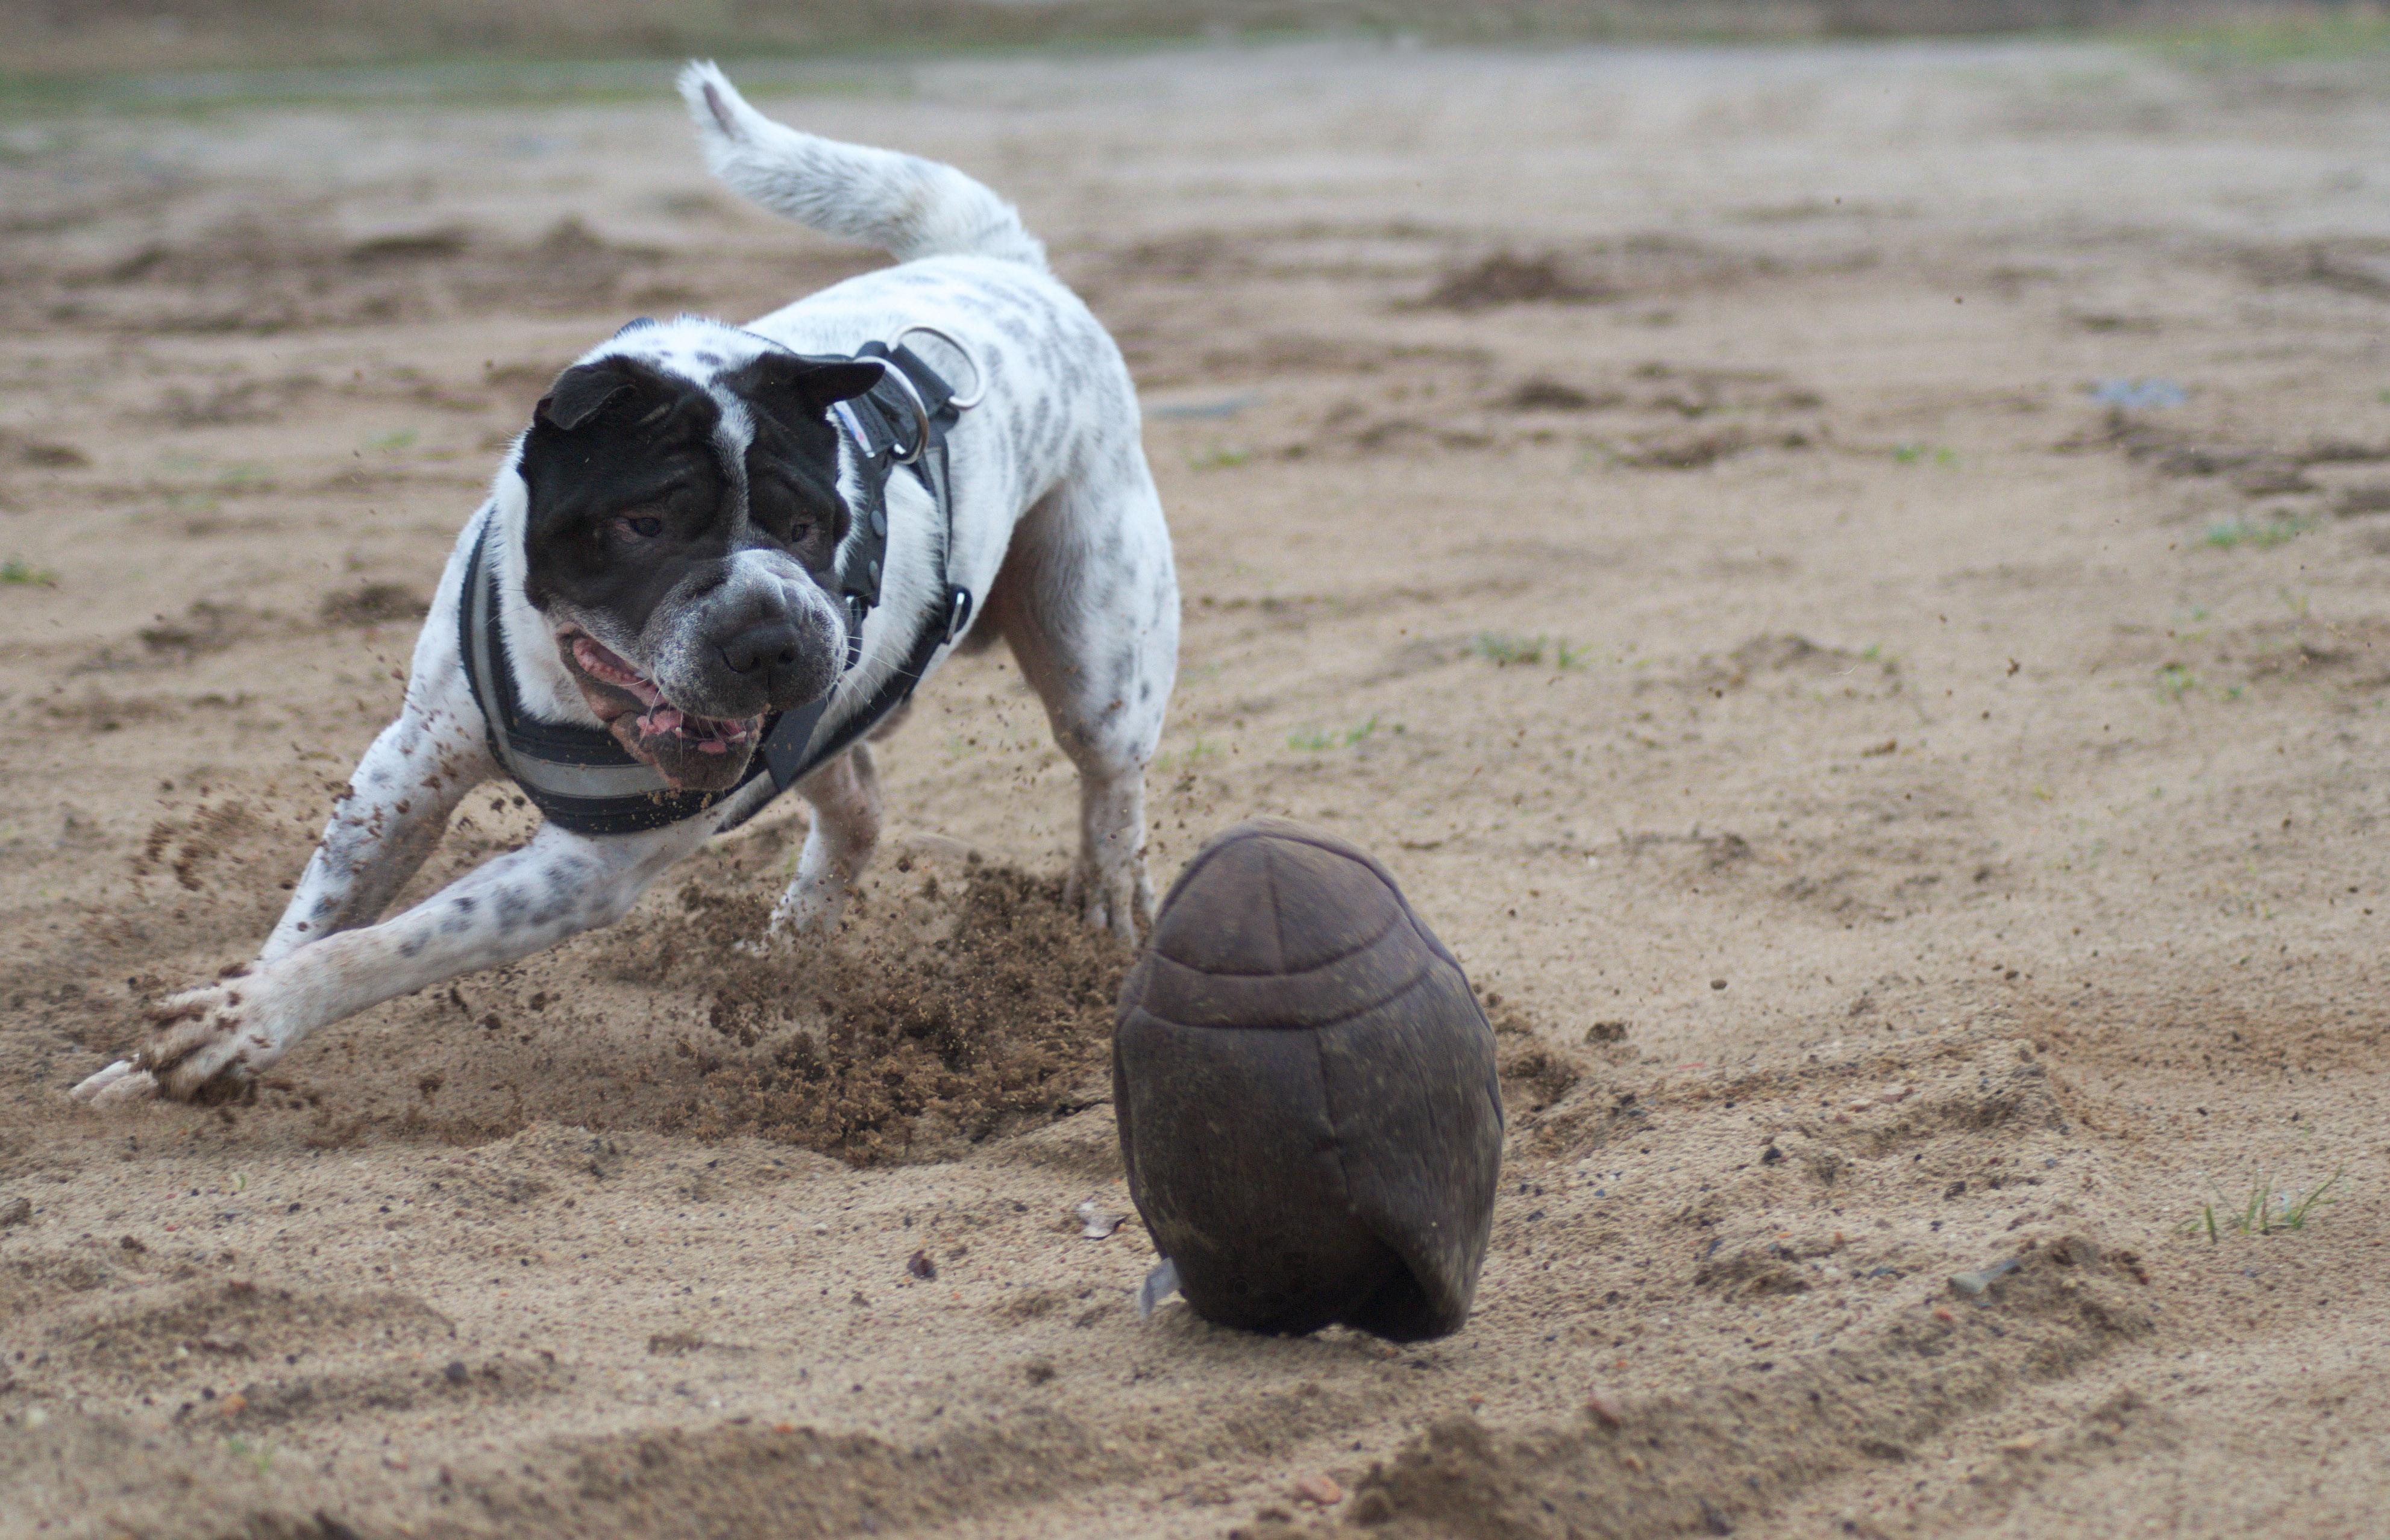 Kingston Rugby Vintage Lixit Test Ball Produkttest Hund Hundeblog Blog Shar Pei Hunde Malous mannigfaltige Welt Rabaukenbande Kingston Spielzeug Meinung Fazit Kauf Tierspielzeug Sand Fotografie